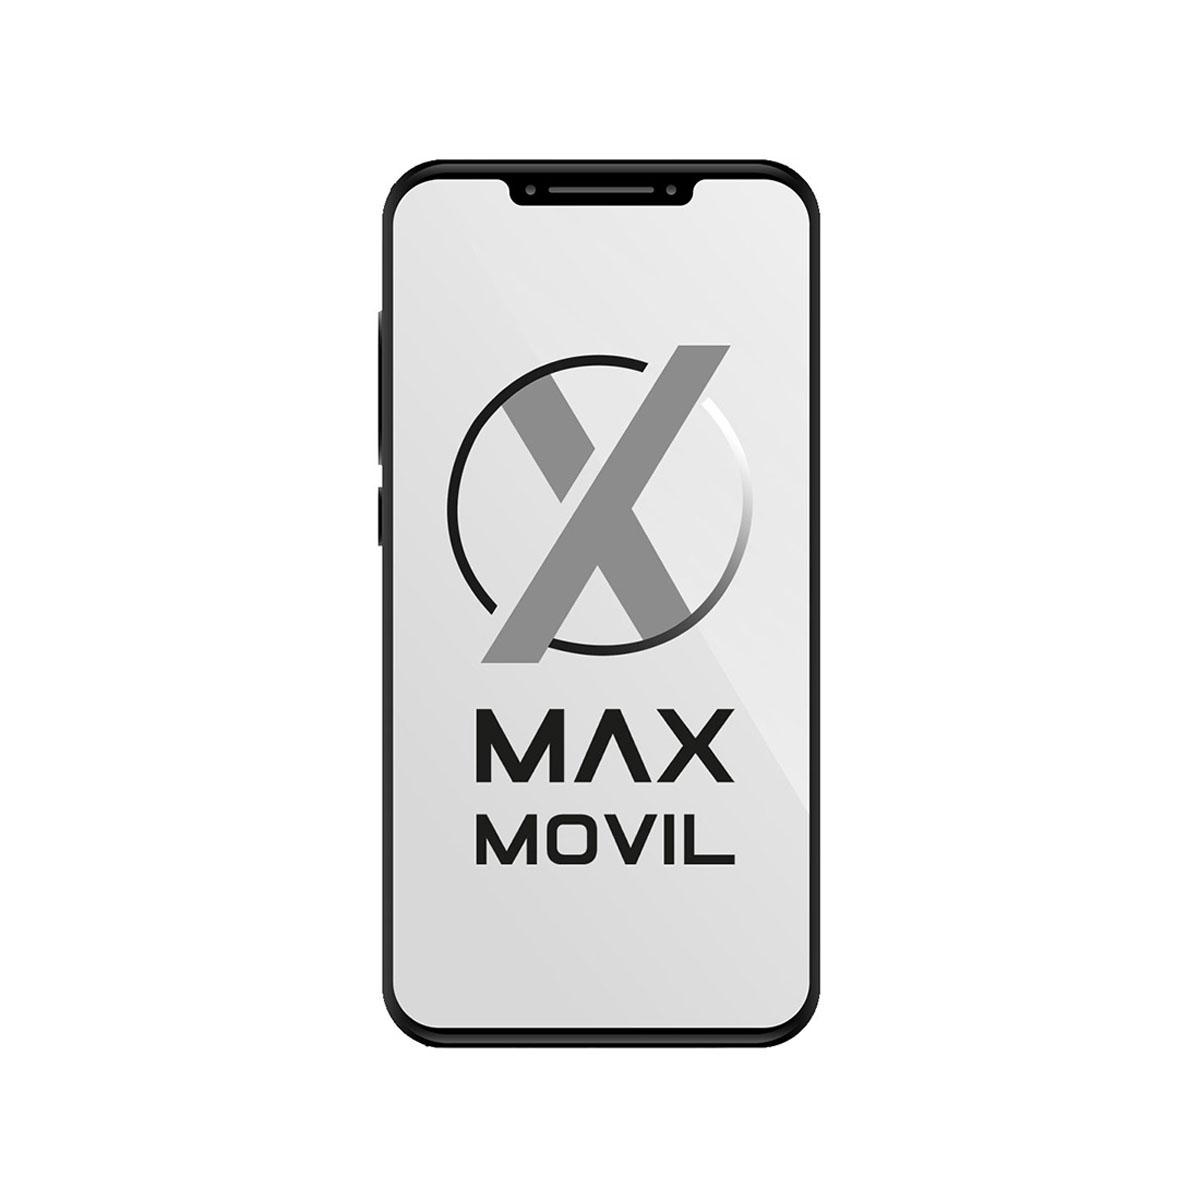 "Funda Smart Cover para iPad Pro 12,9"" de piel Marrón caramelo MPV12ZM/A"